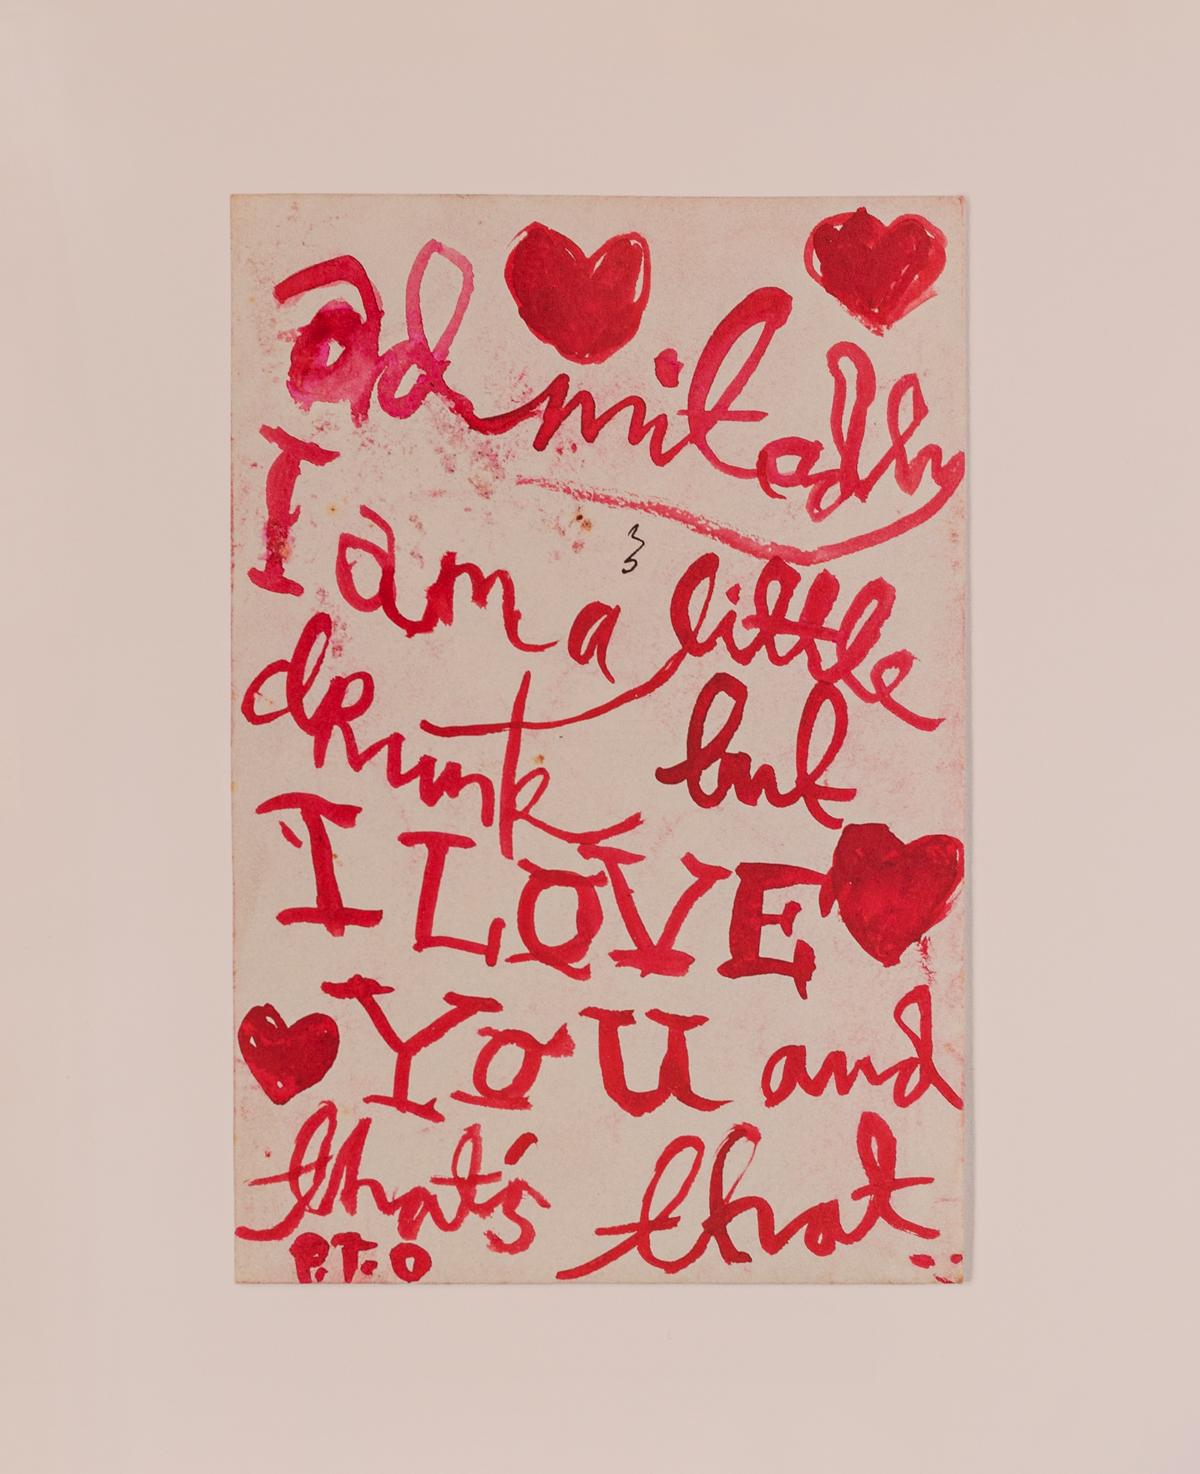 Nick Cave e Anita Lane: quando l'amore diventa arte